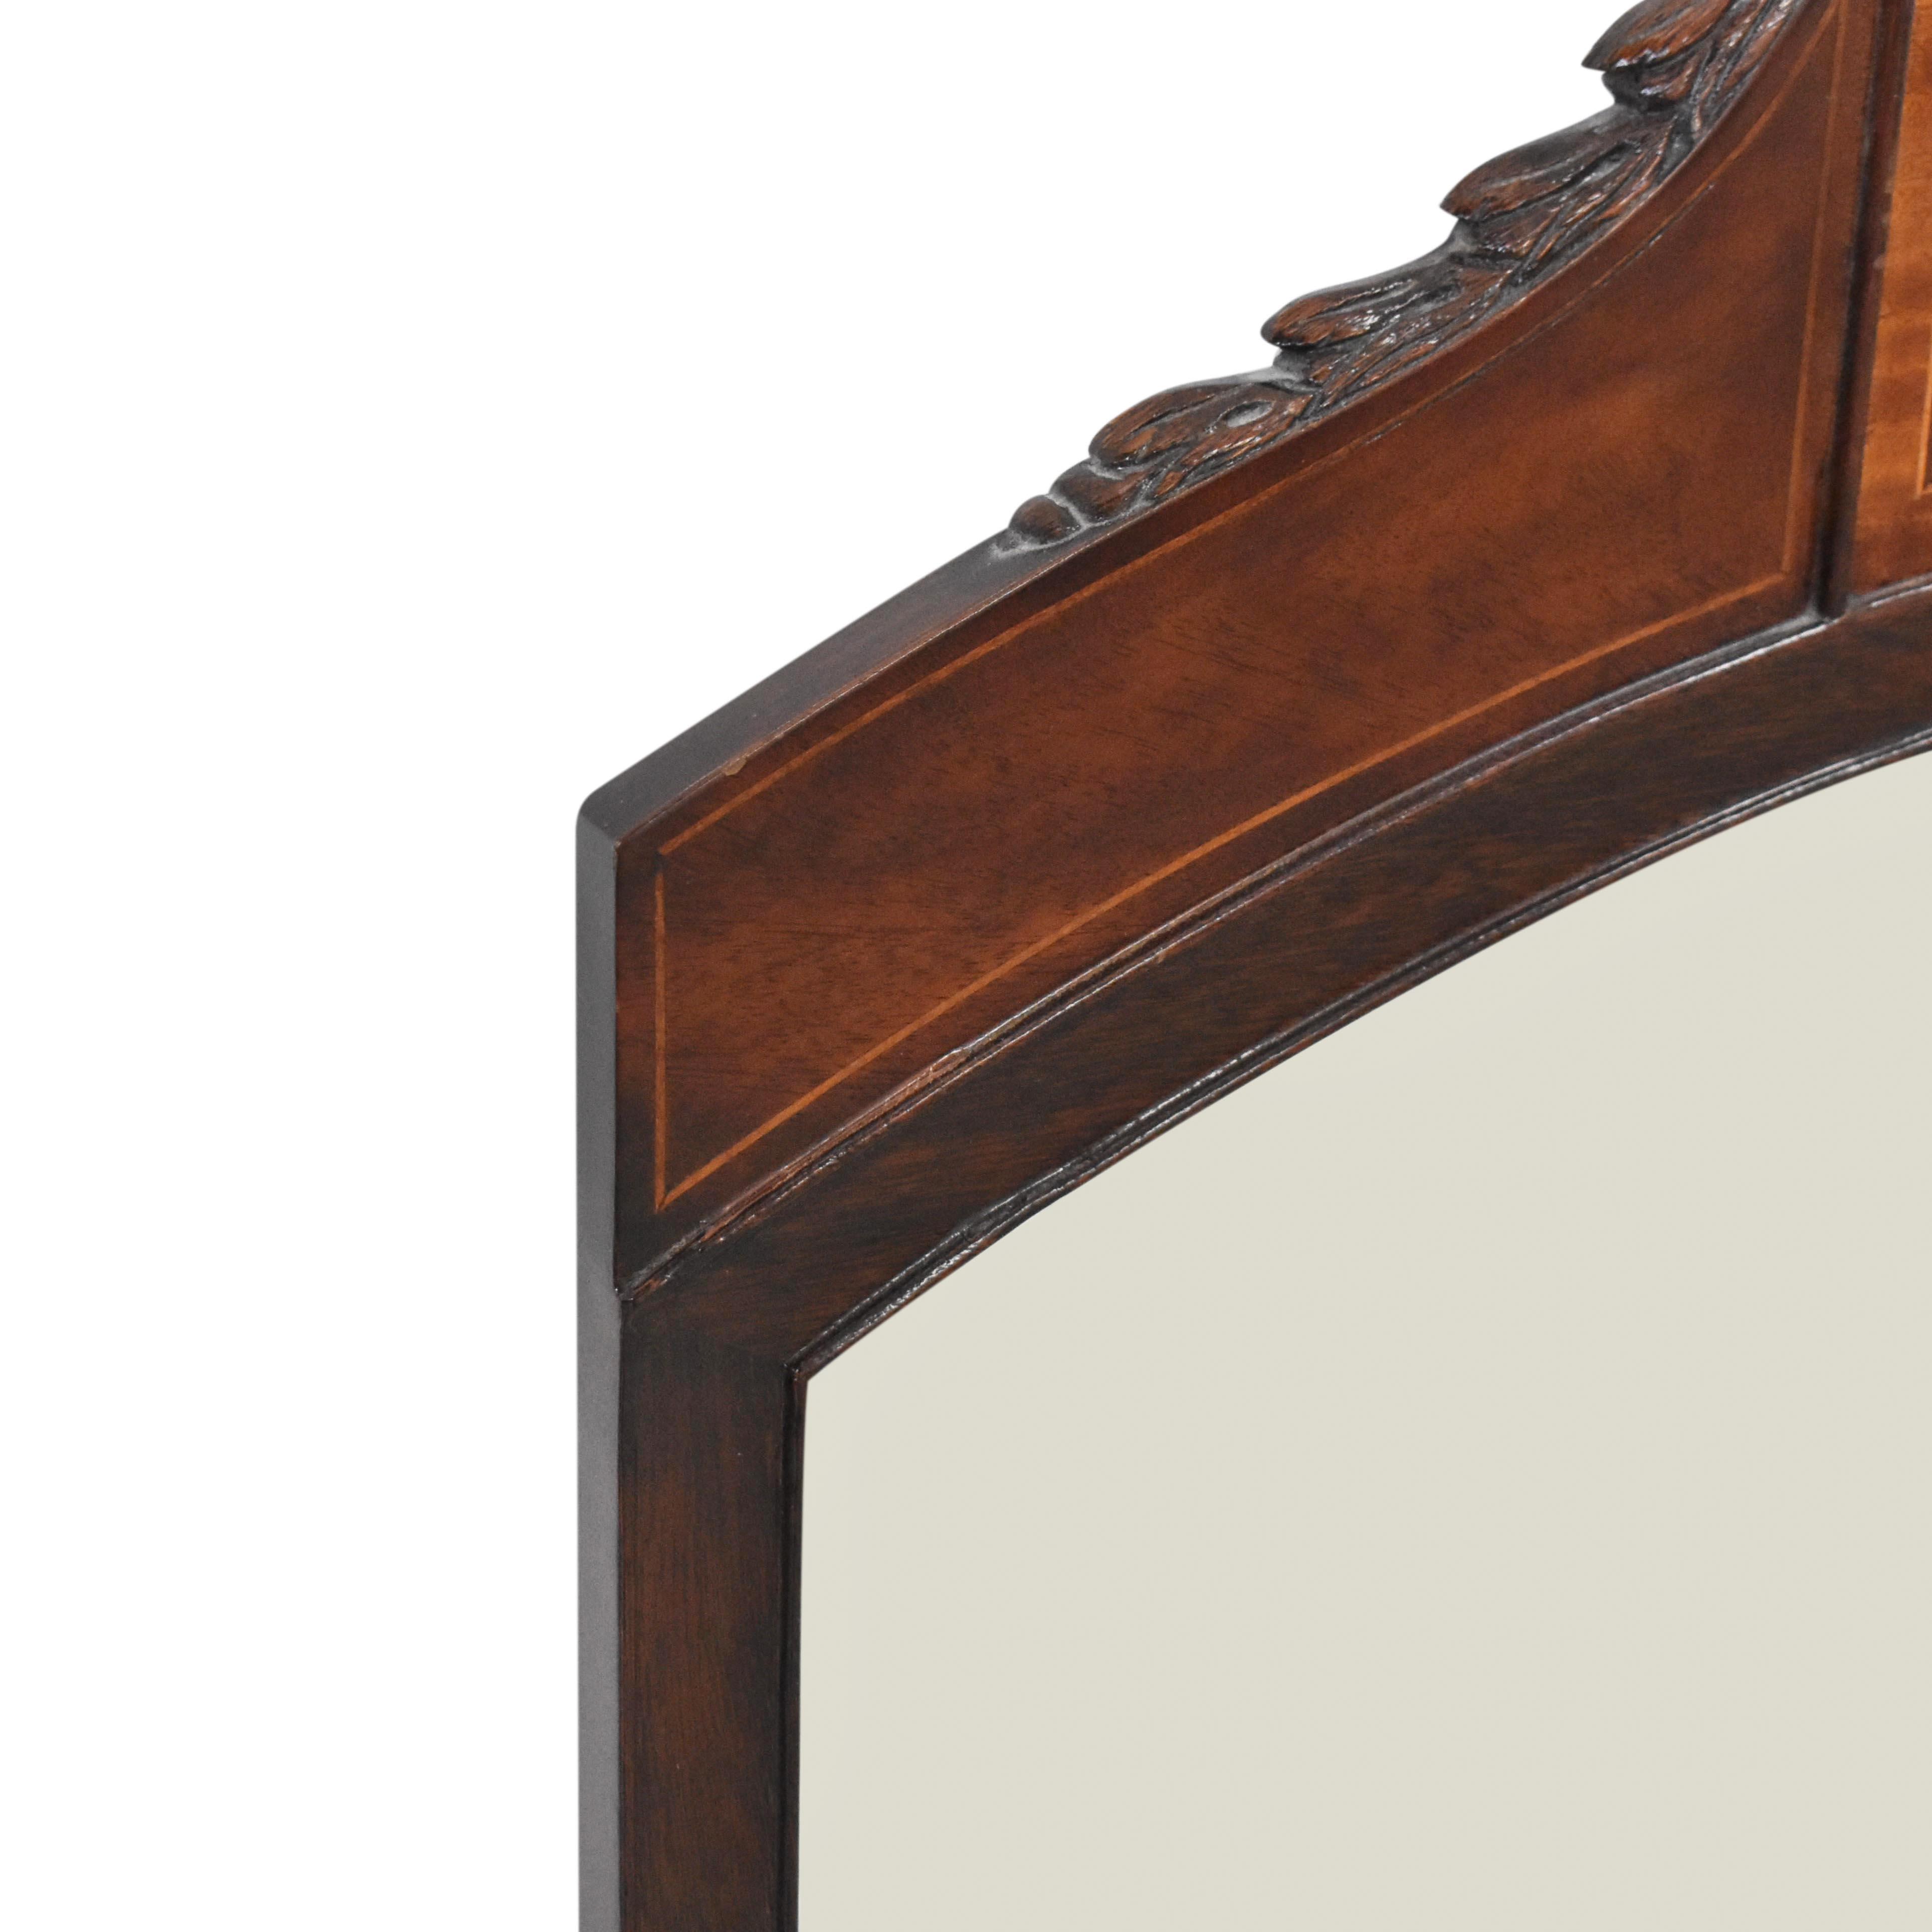 Flint & Horner Flint & Horner Antique Inlaid Mirror ma